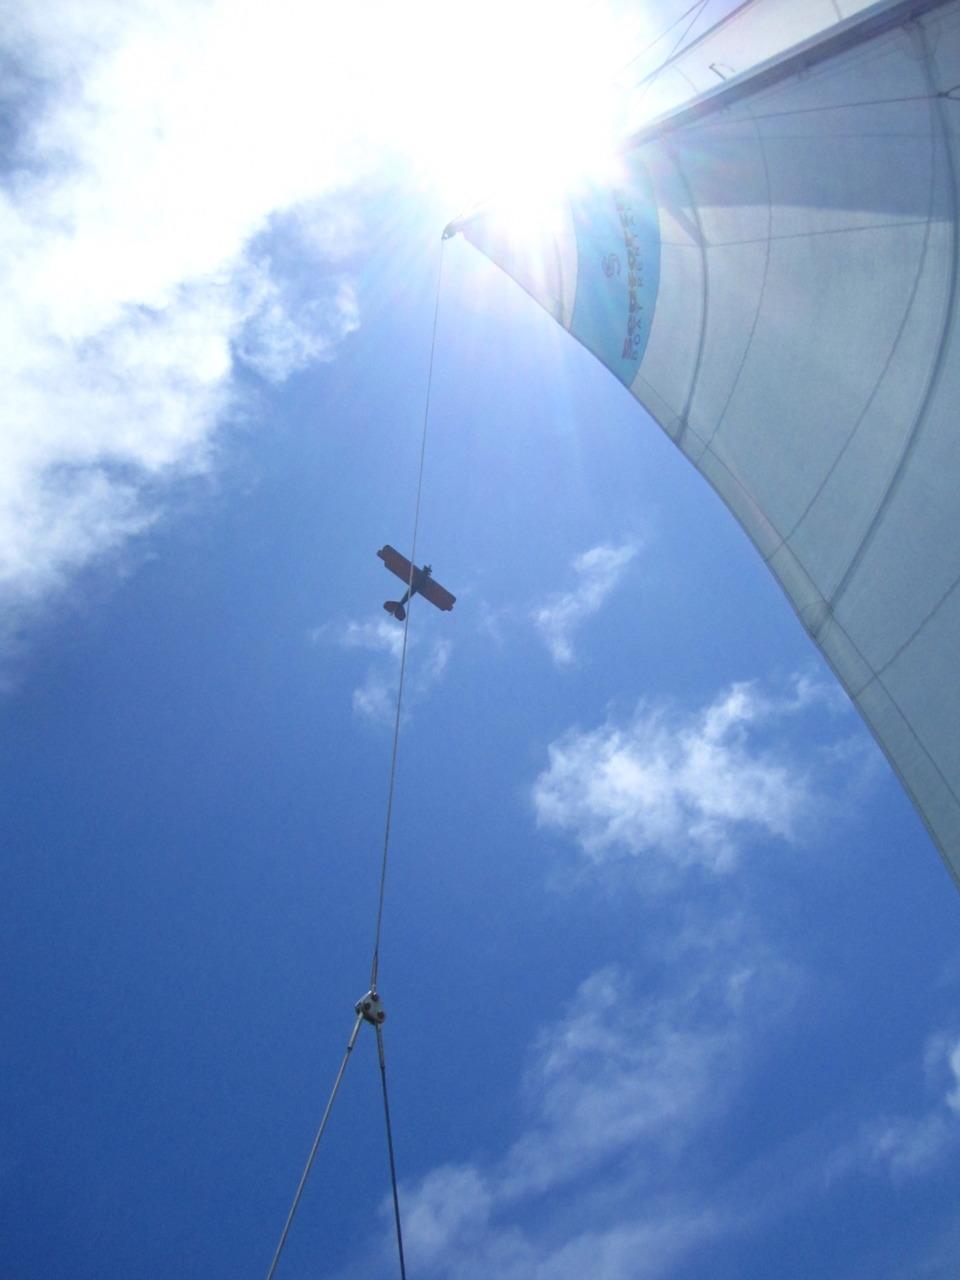 Bi-plane / sail-boat. San Diego, CA